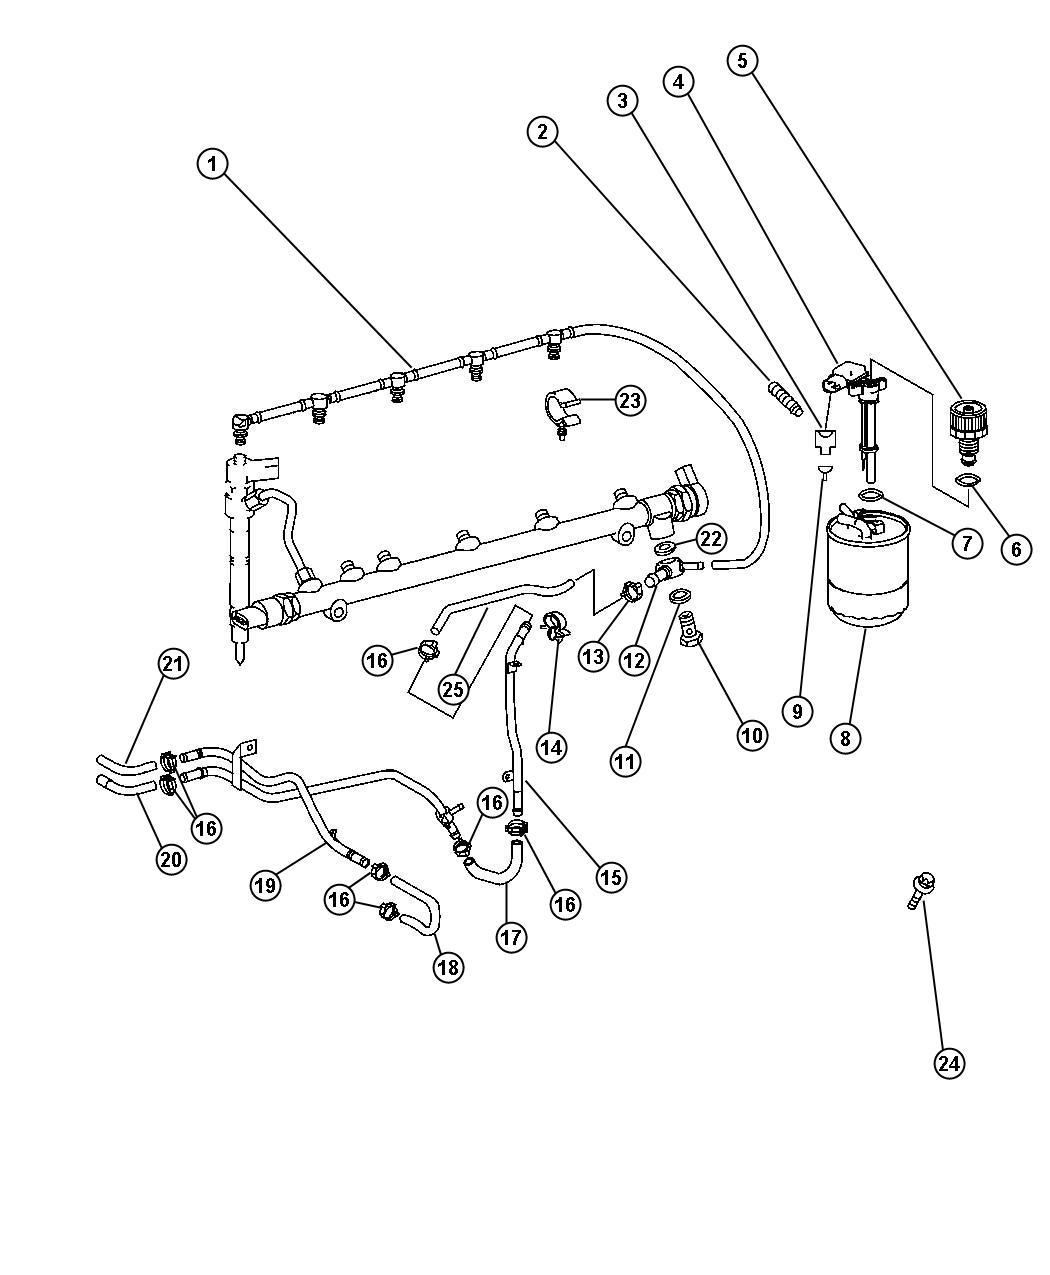 Dodge Viper Screw. Fuel filter screw, to fuel filter